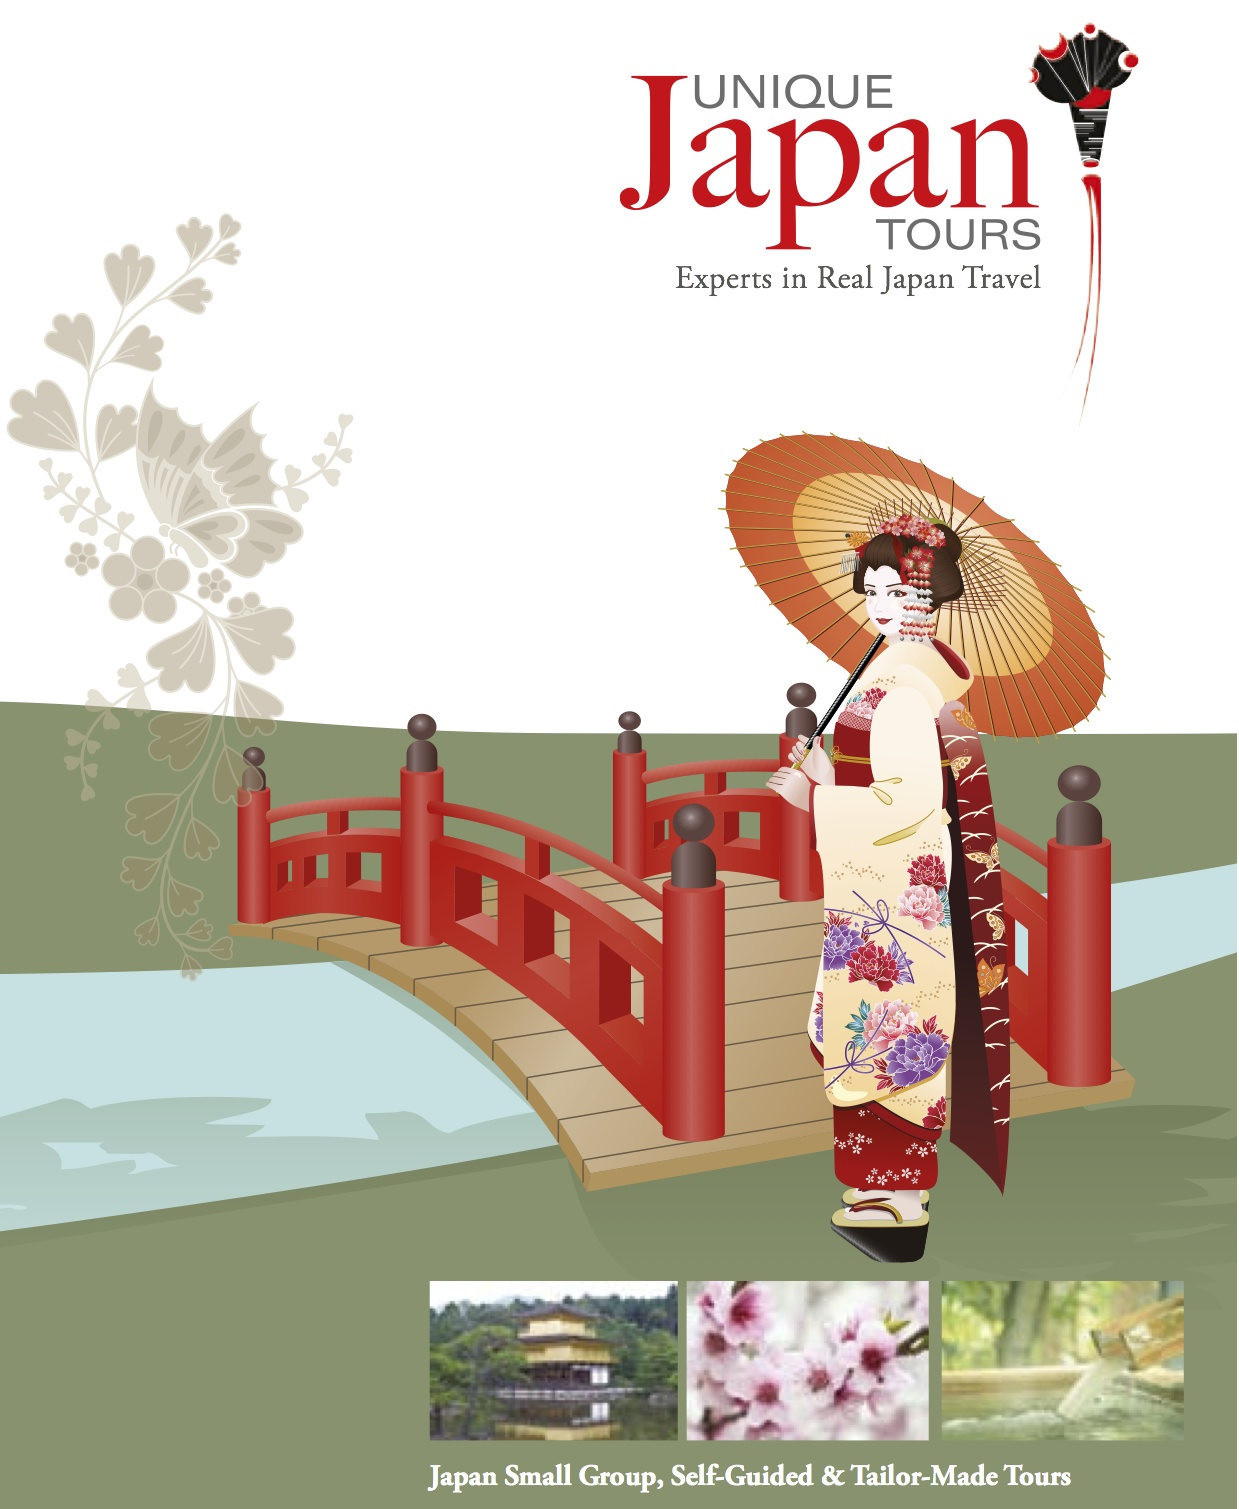 japan travel brochure template - brochure kiosk pics 2013